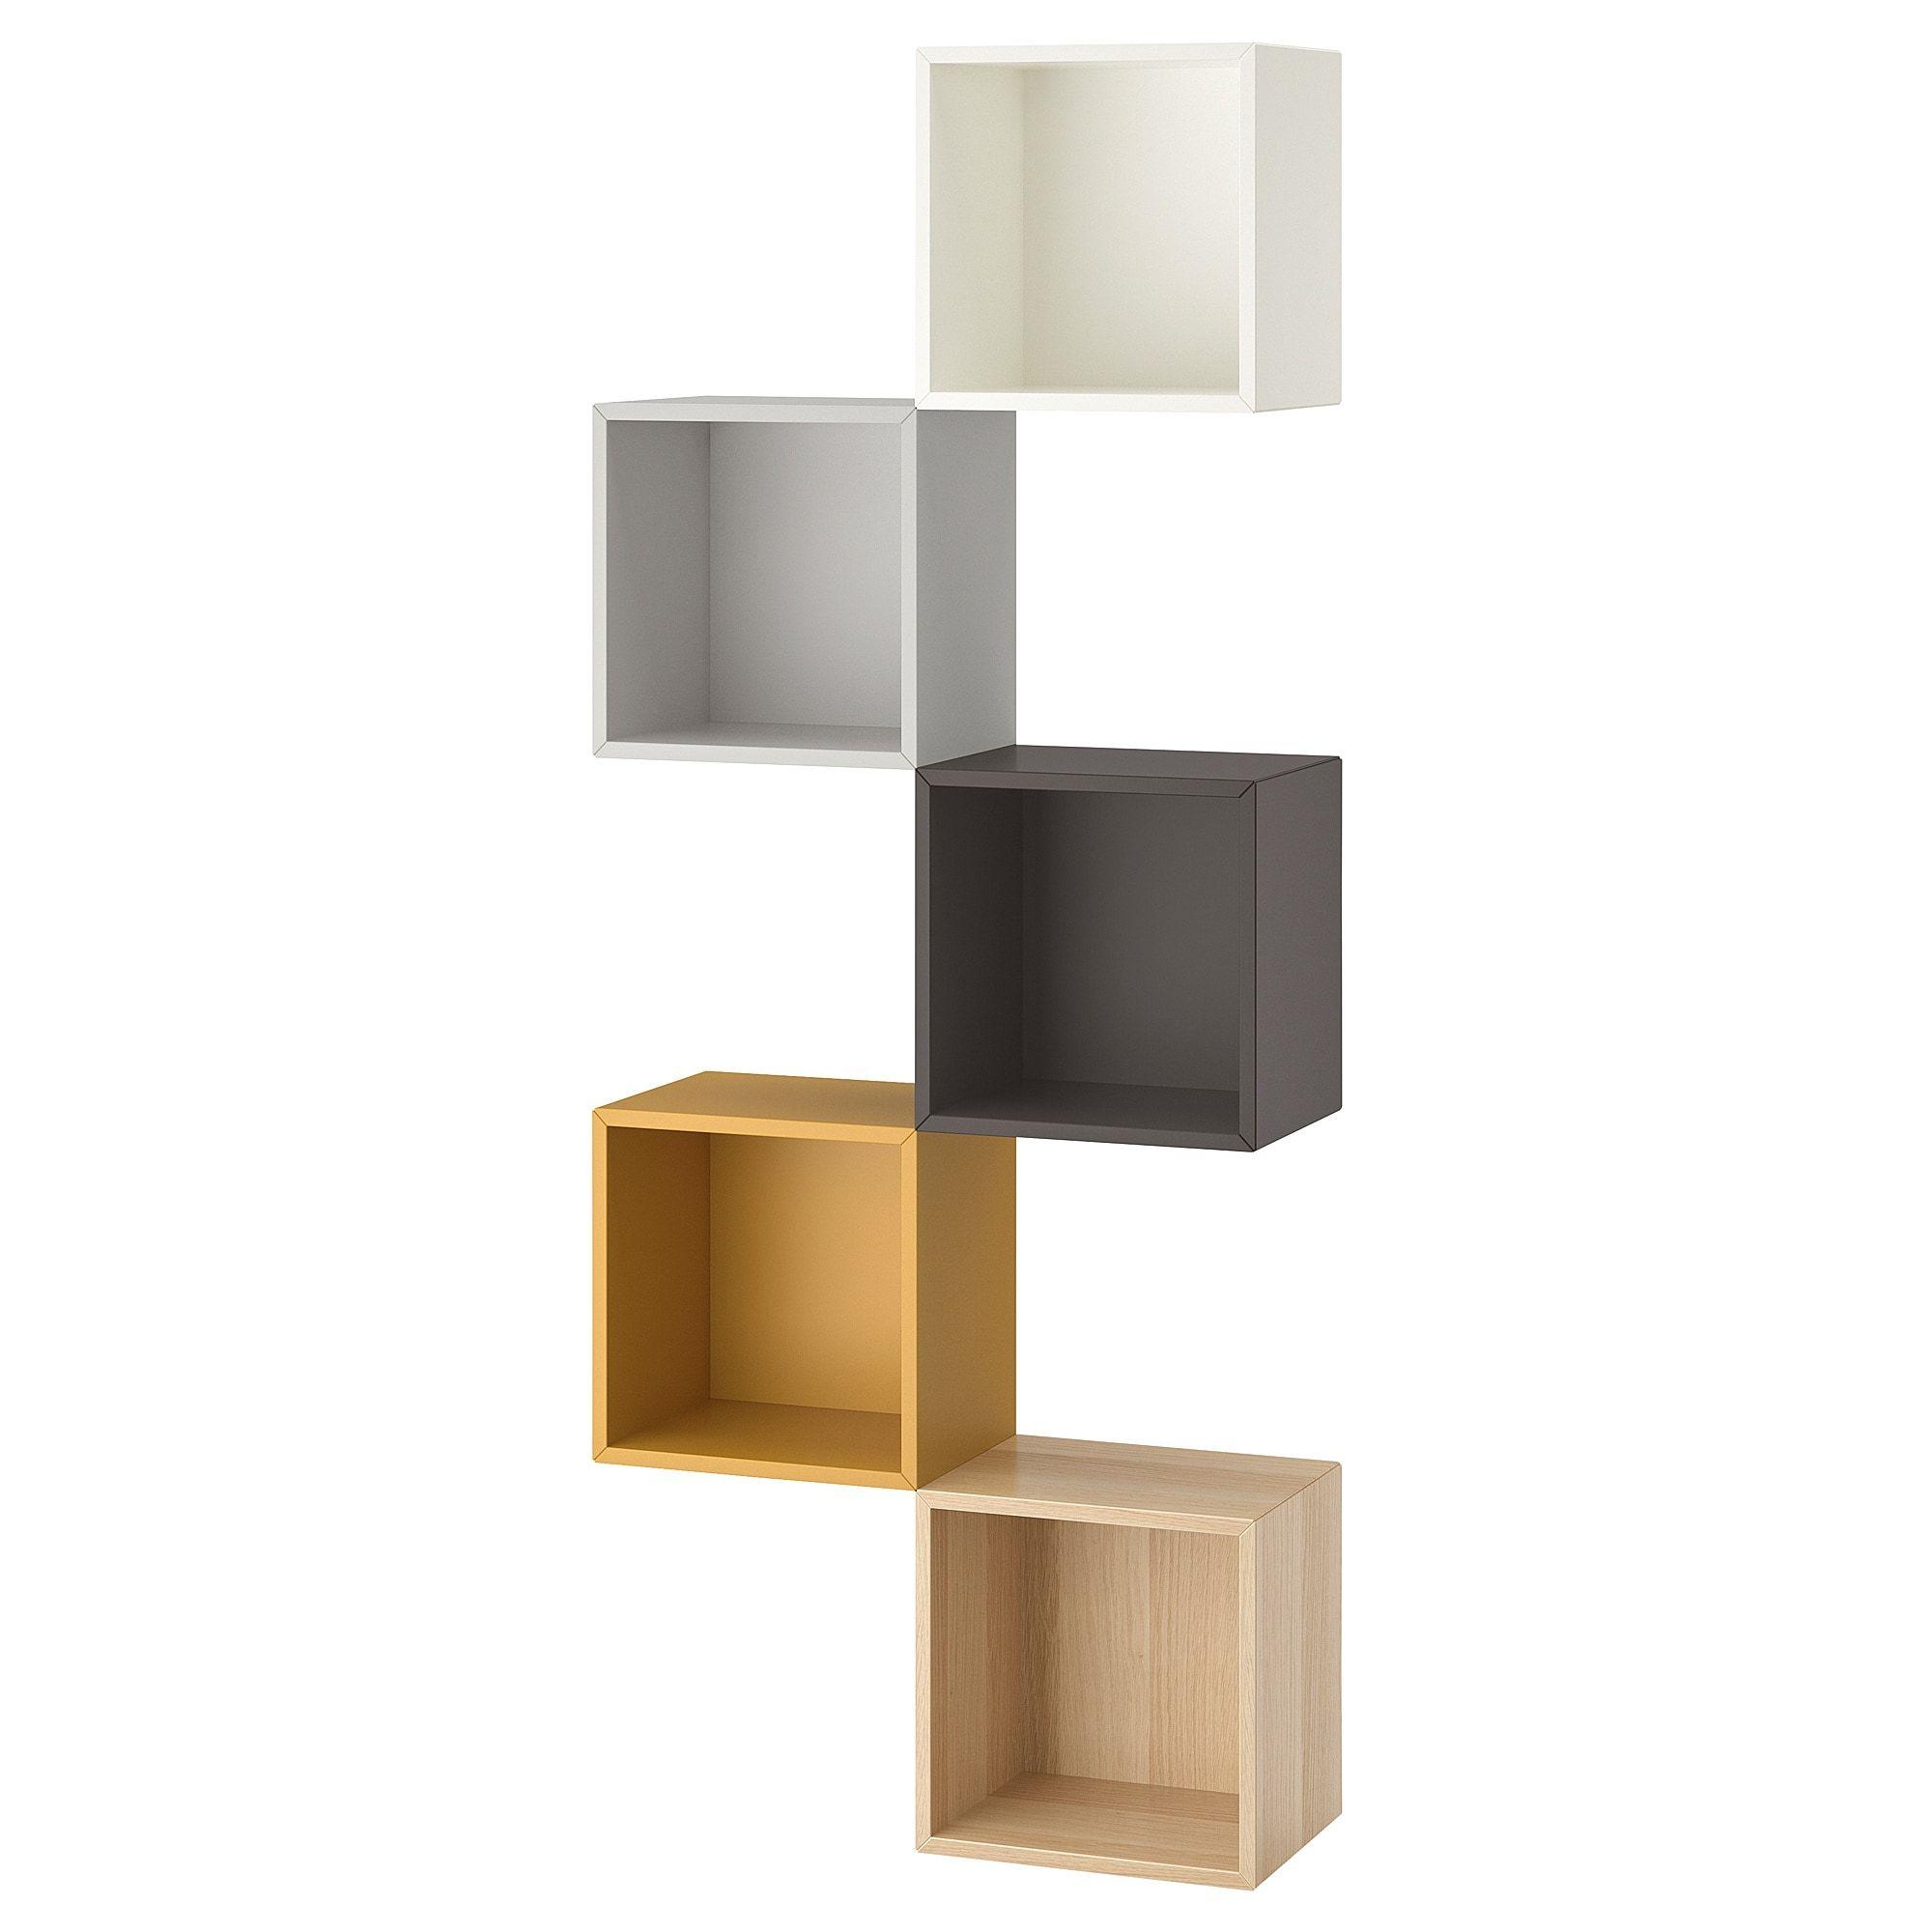 Eket Wall Mounted Storage Combination Multicolor 1 27 1 2x9 7